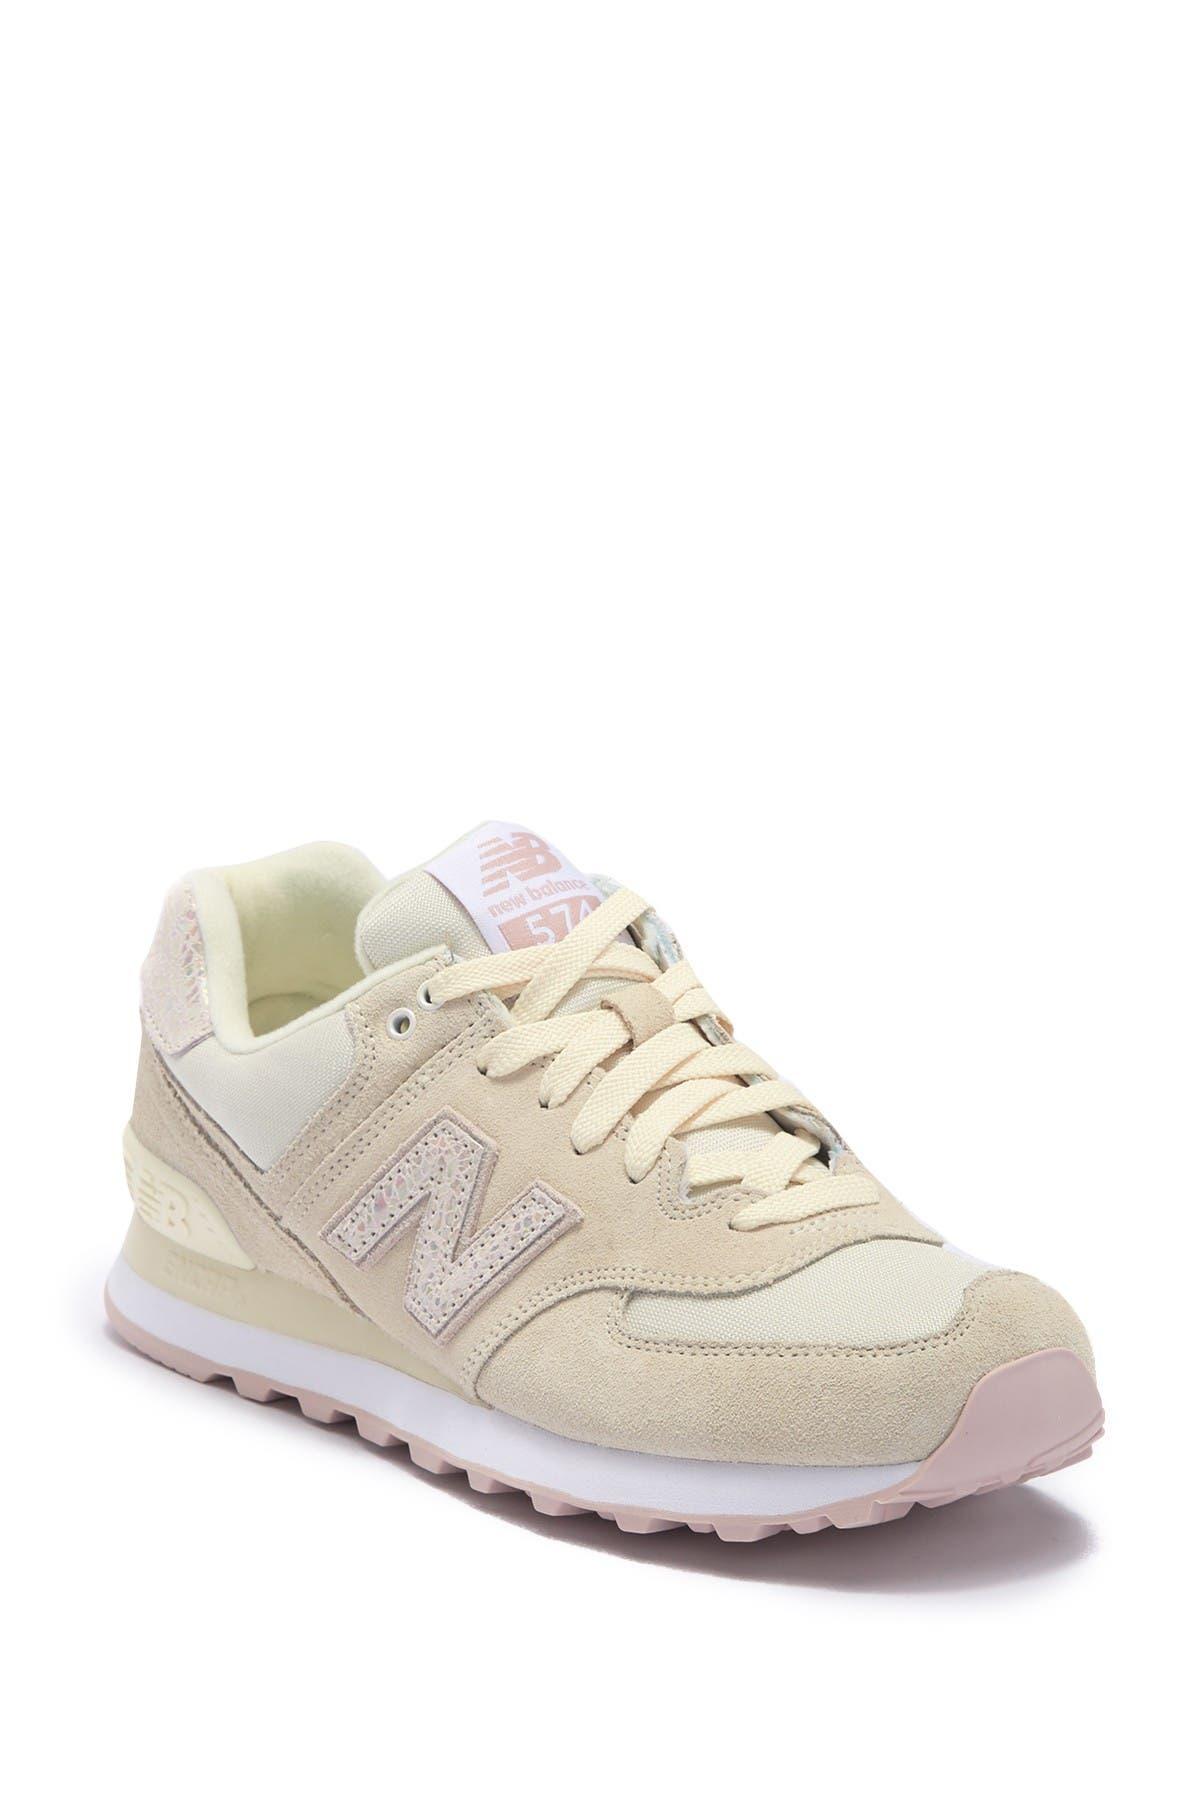 Faial respuesta pulgar  New Balance | Encap 574 Classic Sneaker | Nordstrom Rack